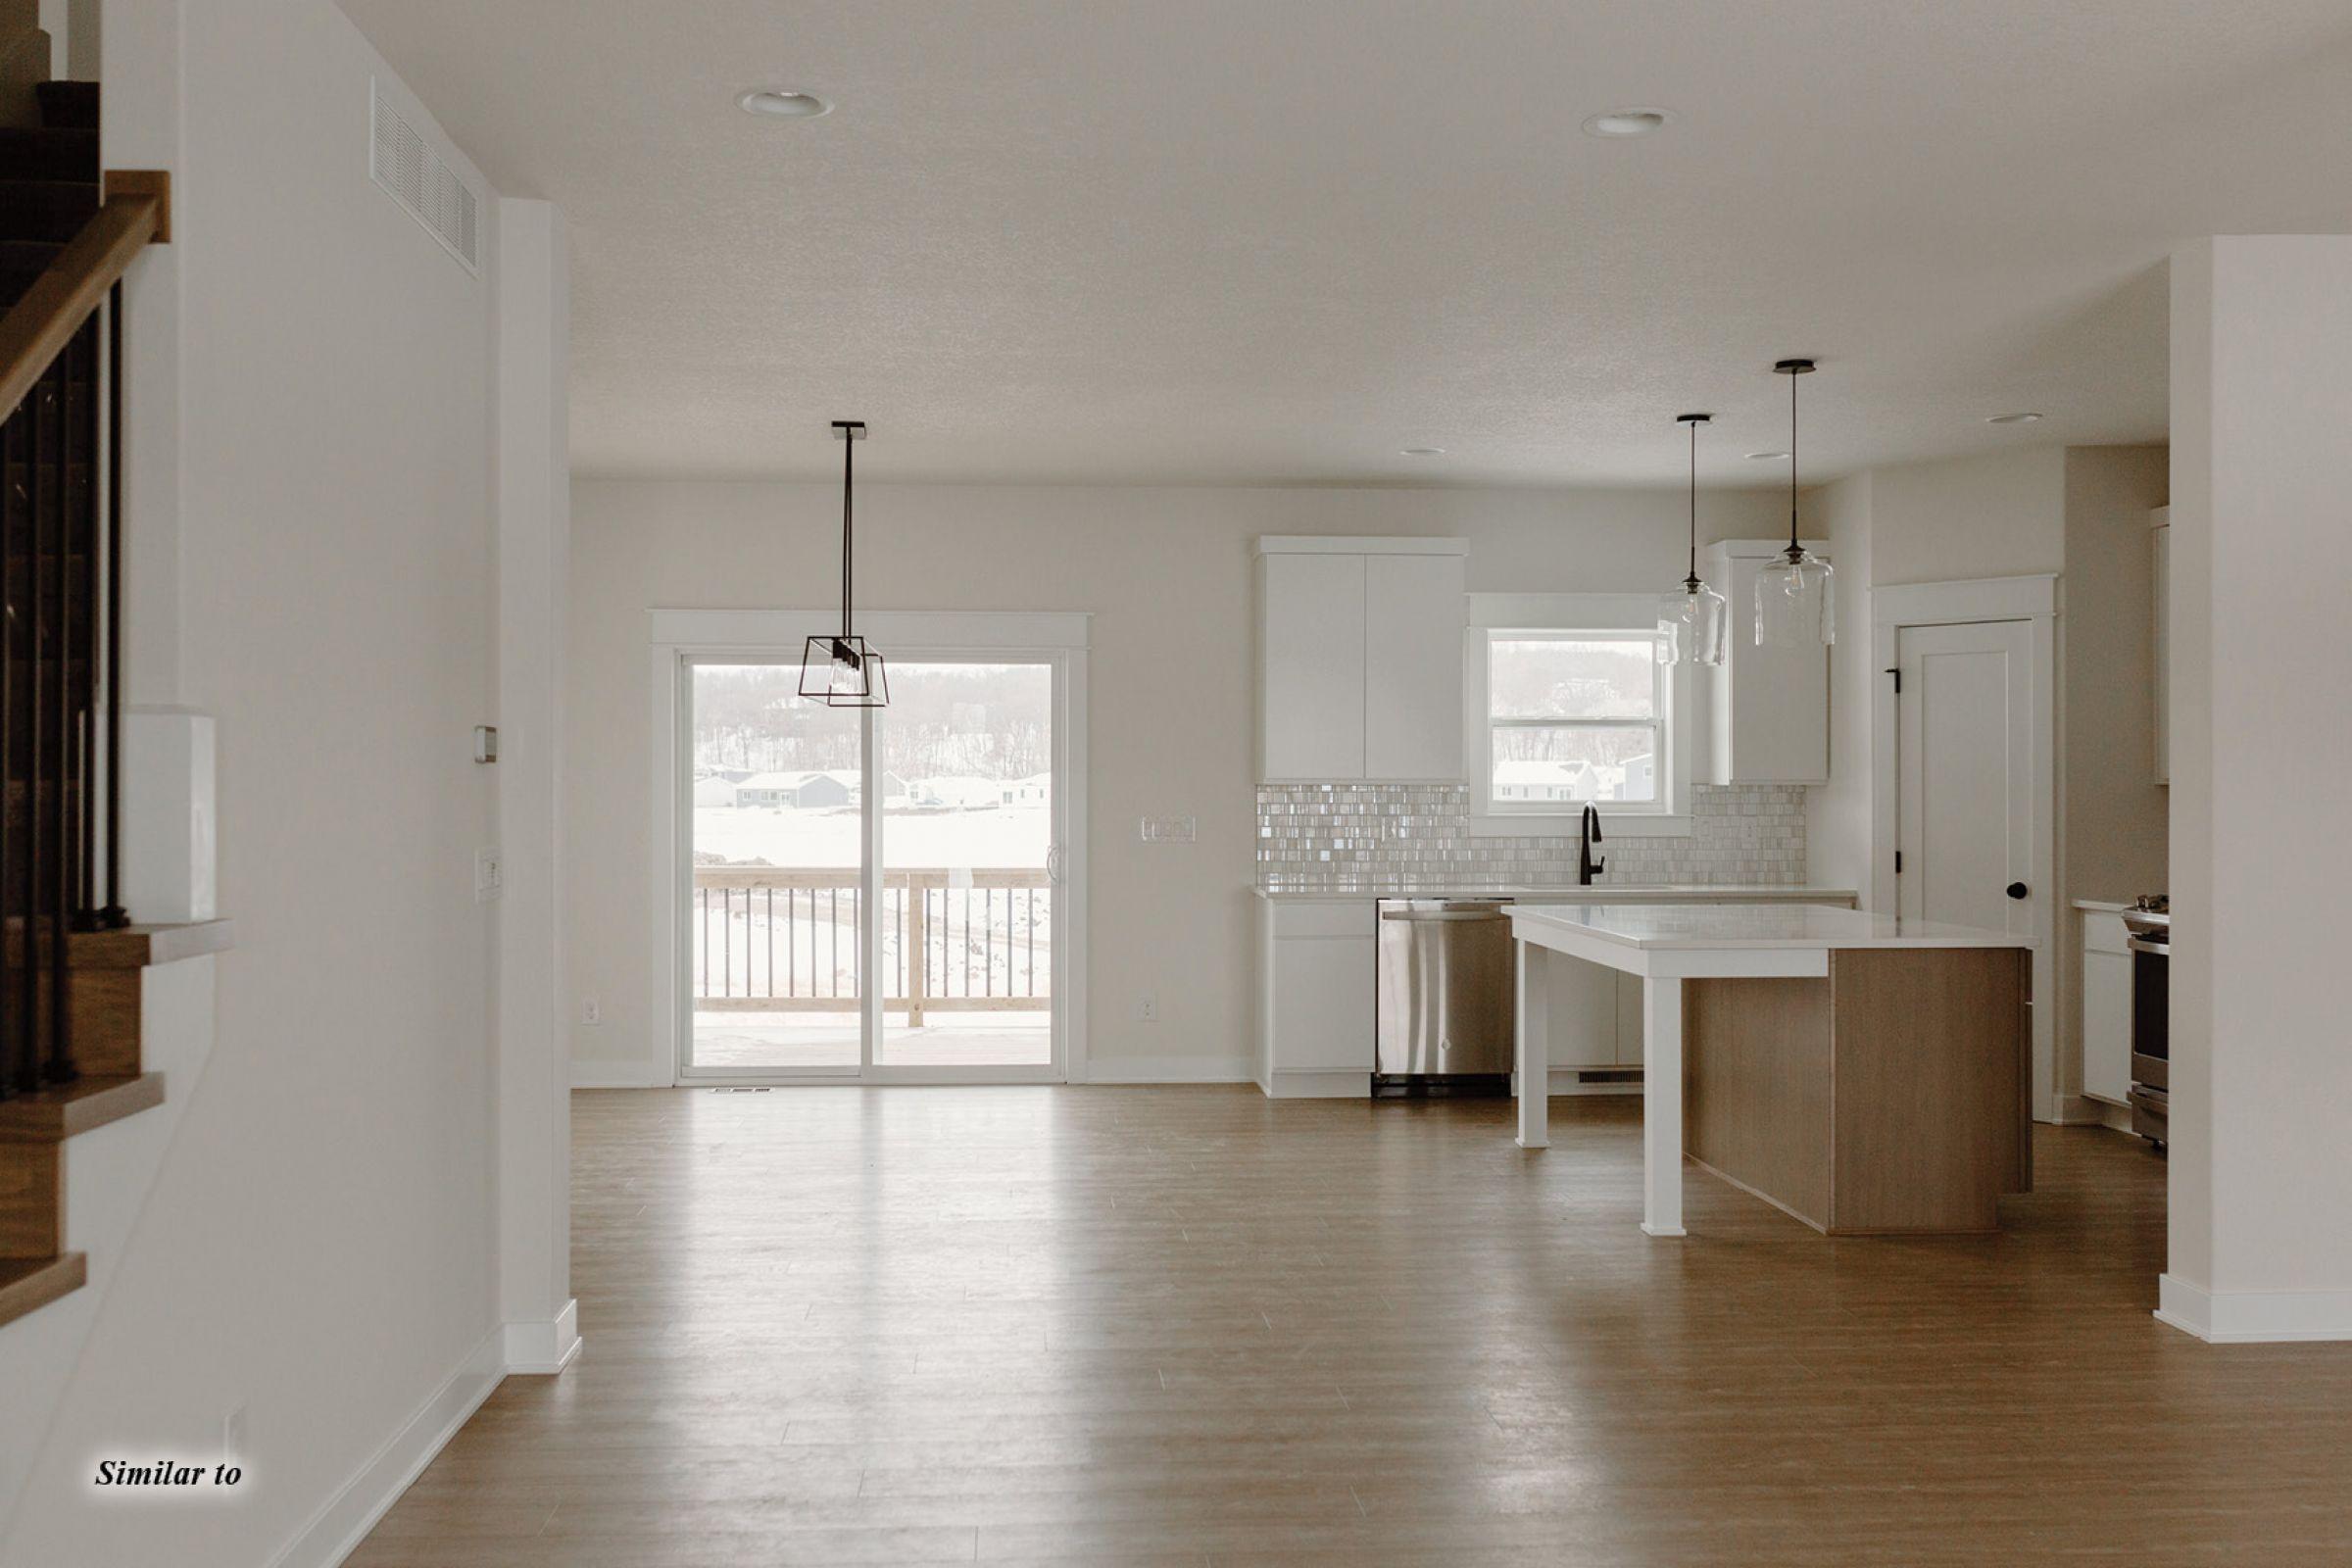 residential-polk-county-iowa-0-acres-listing-number-15443-2-2021-04-02-195827.jpg